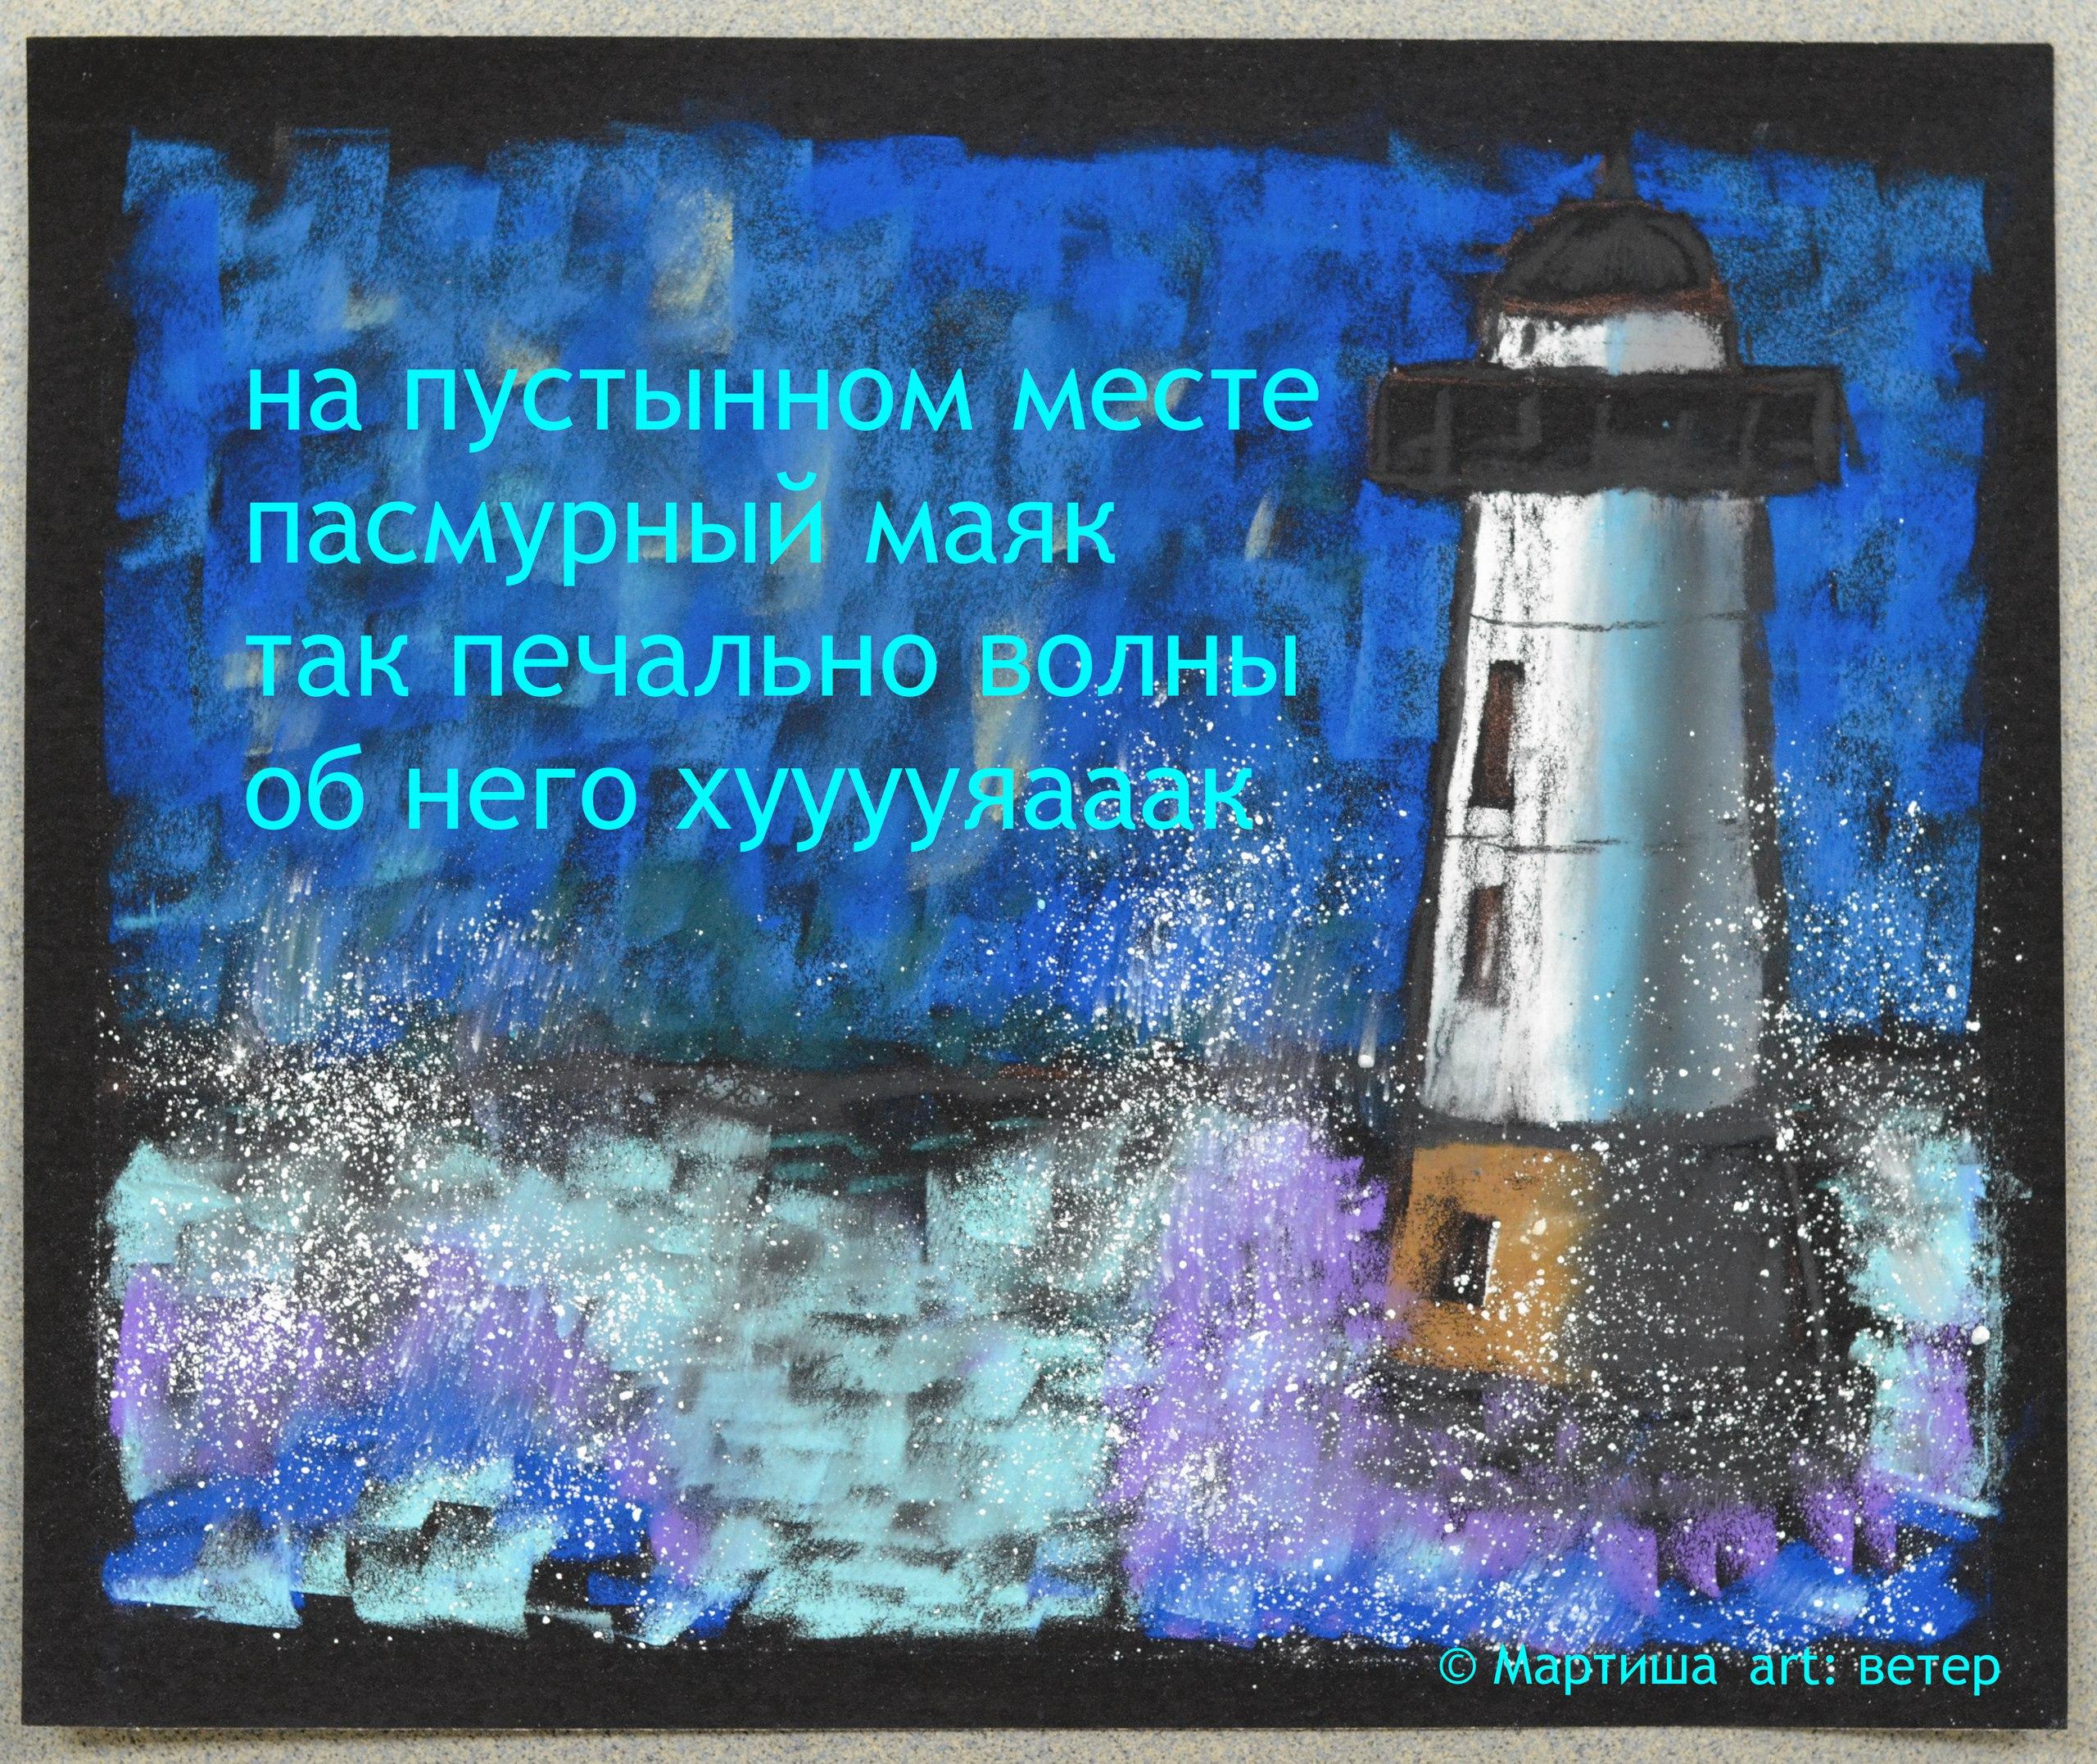 http://s1.uploads.ru/17vFJ.jpg